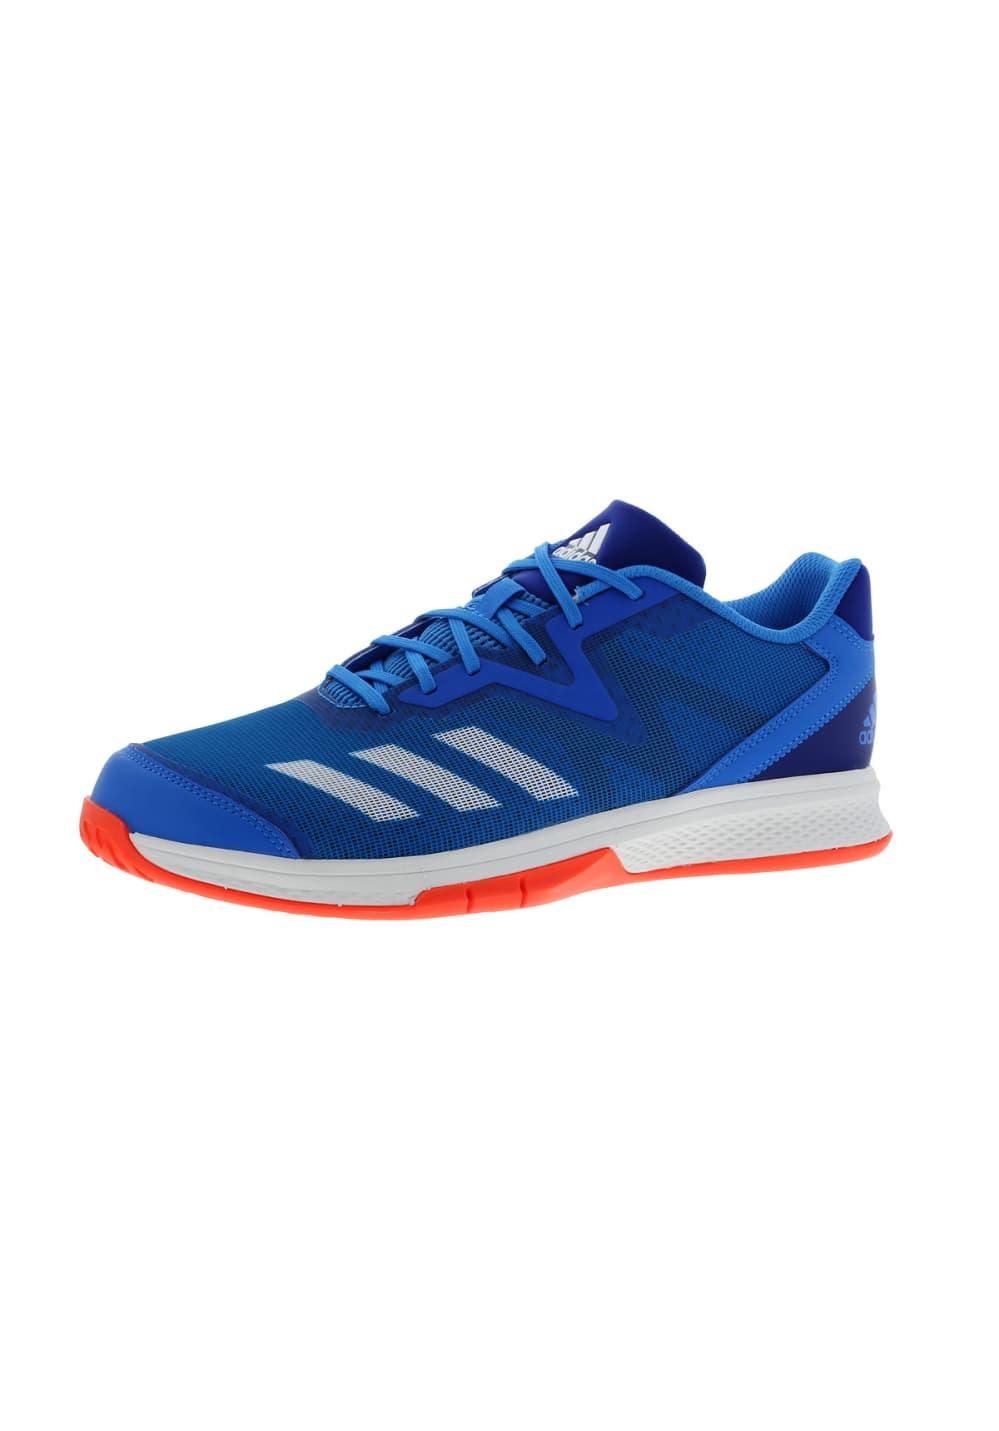 adidas Counterblast Exadic Chaussures handball pour Homme Bleu